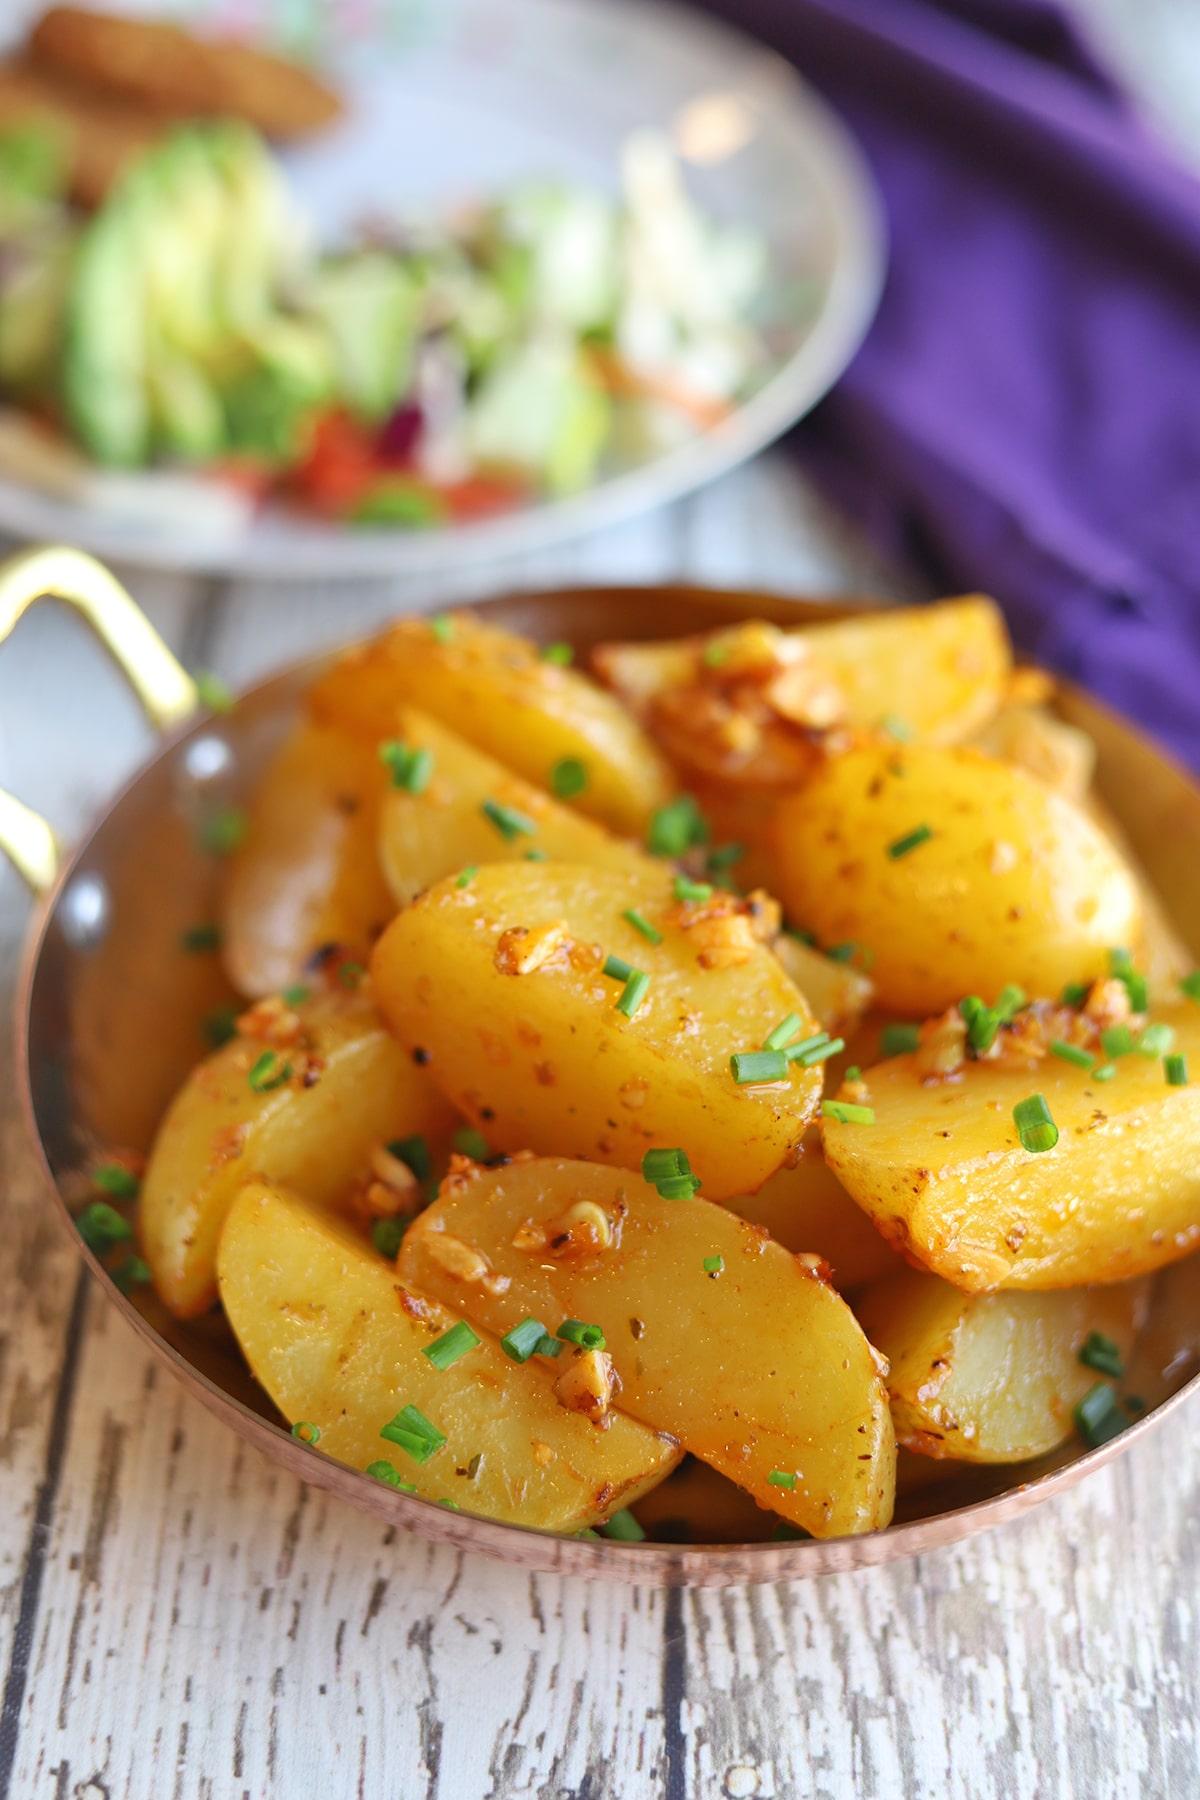 Close-up Yukon gold potatoes in serving dish.